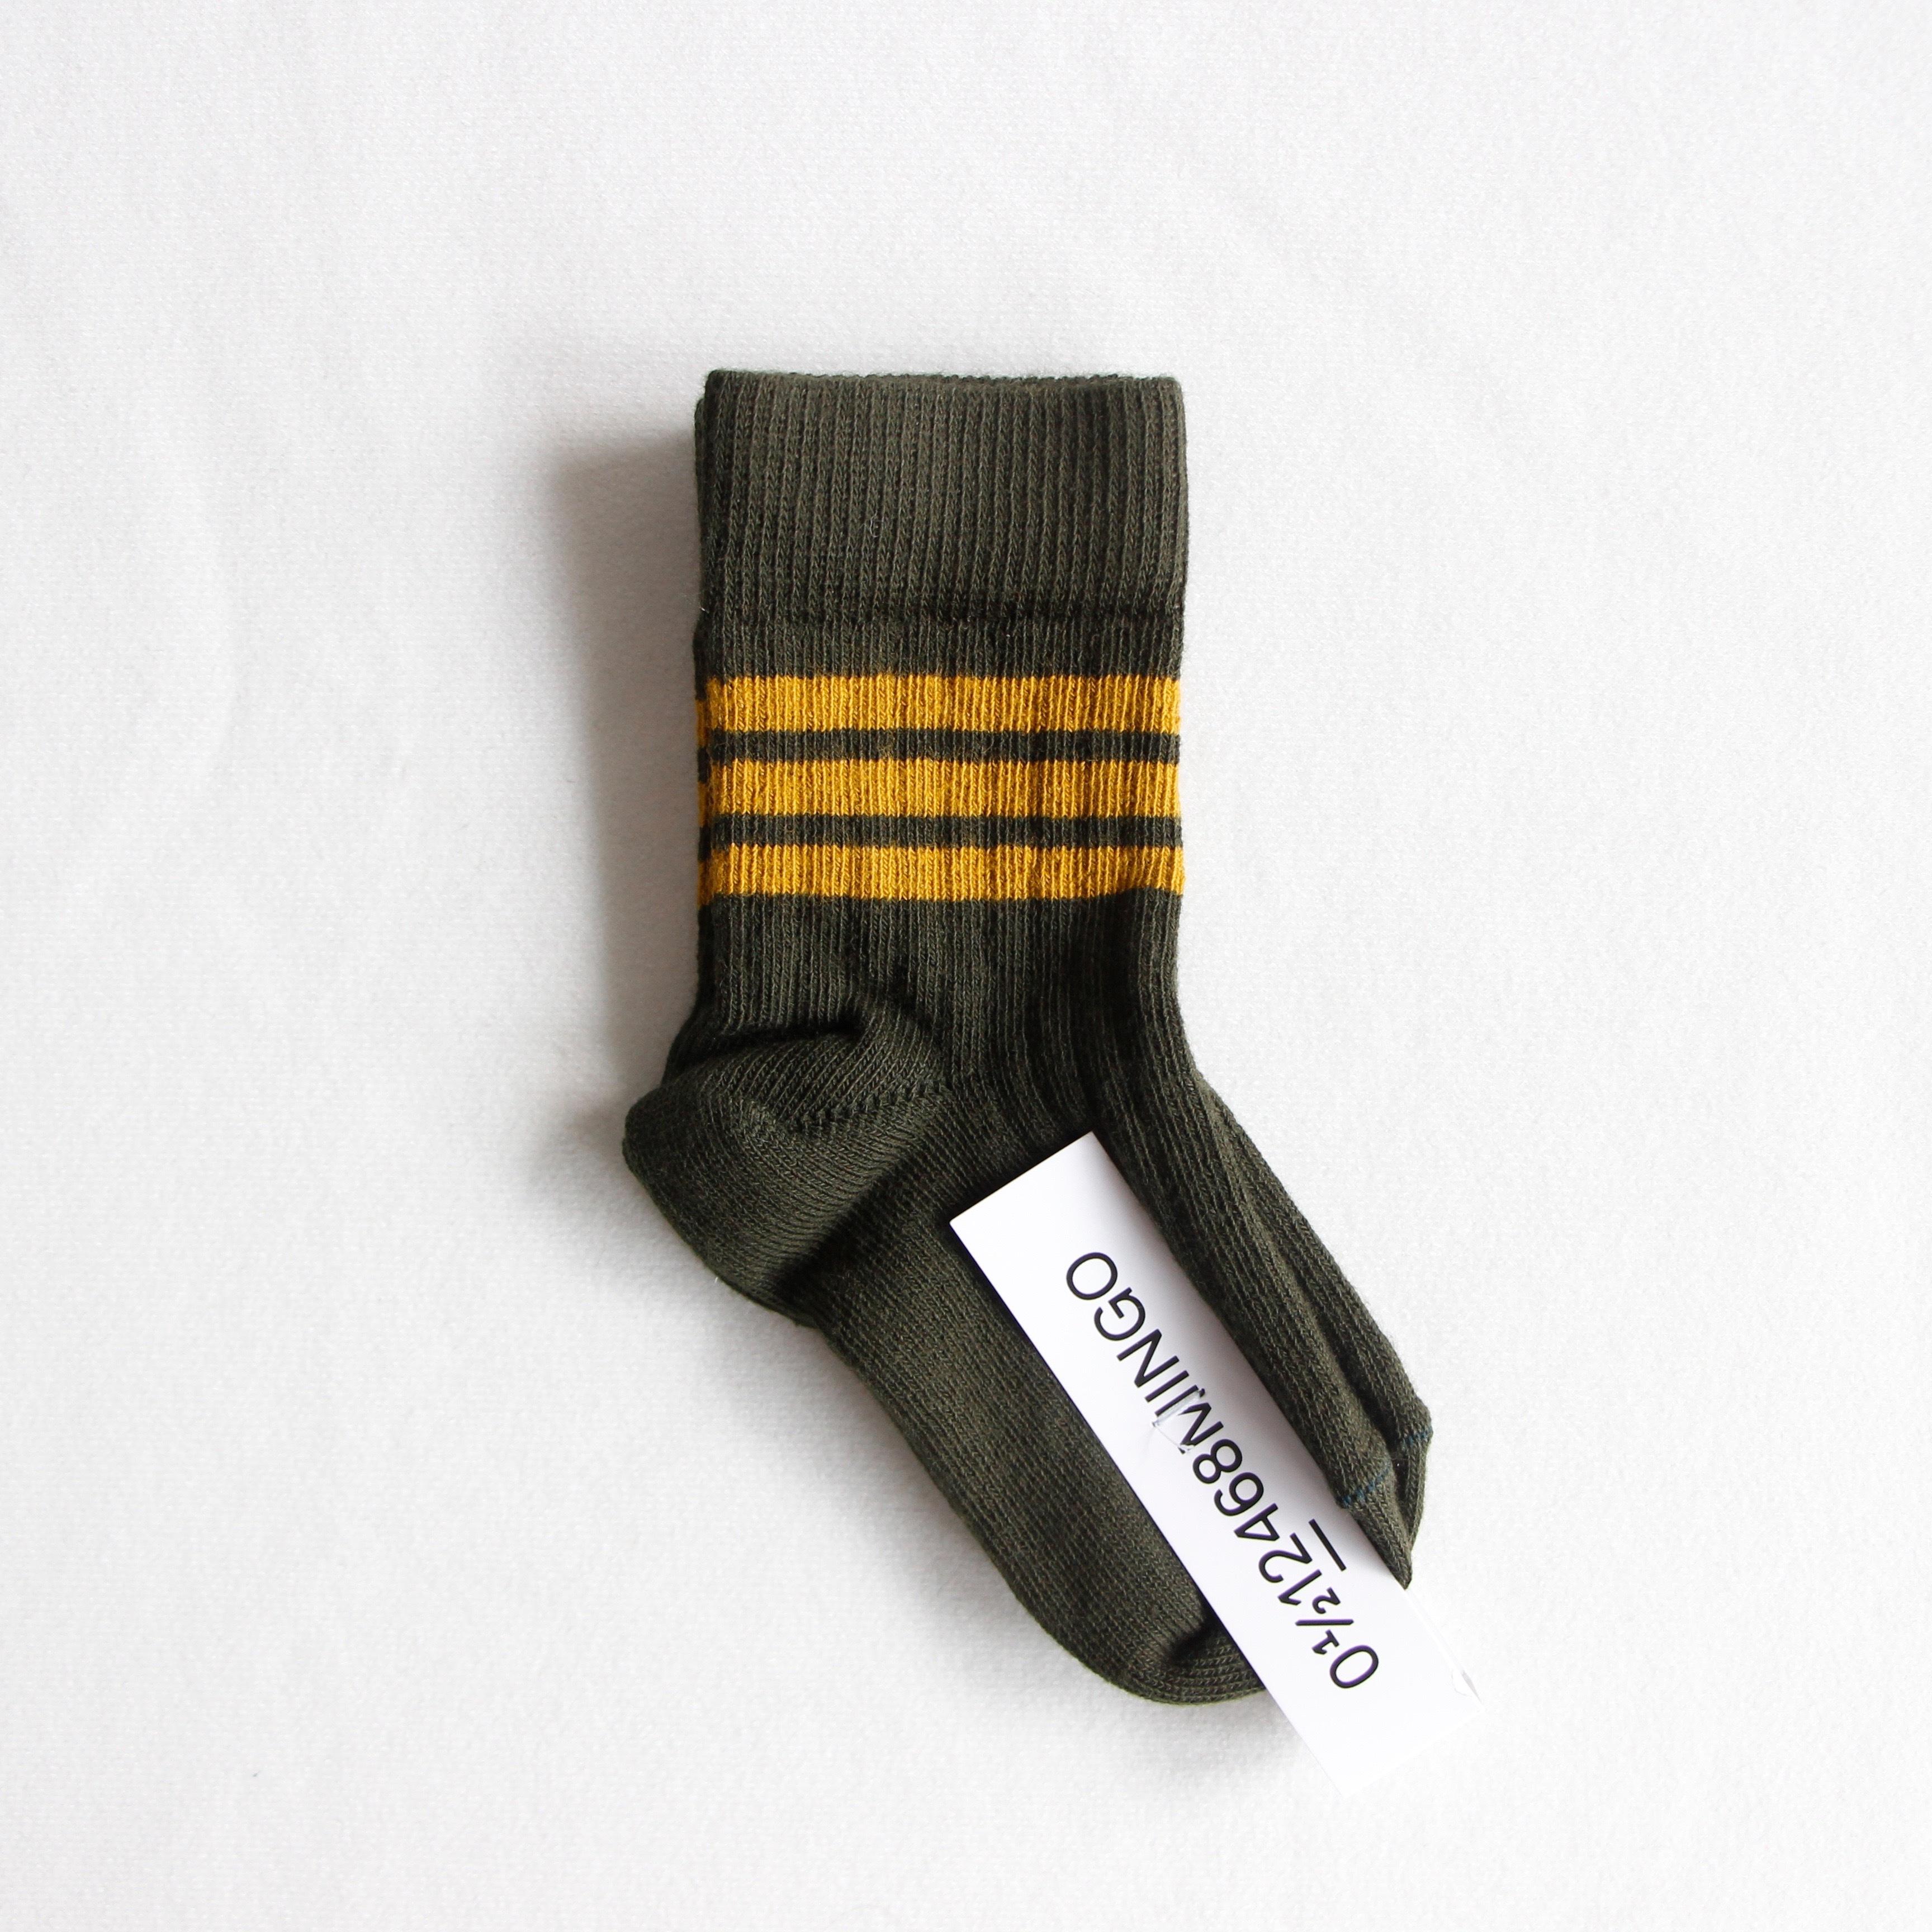 《MINGO. 2020AW》Socks Rib / Stripes Ochre × Forest night